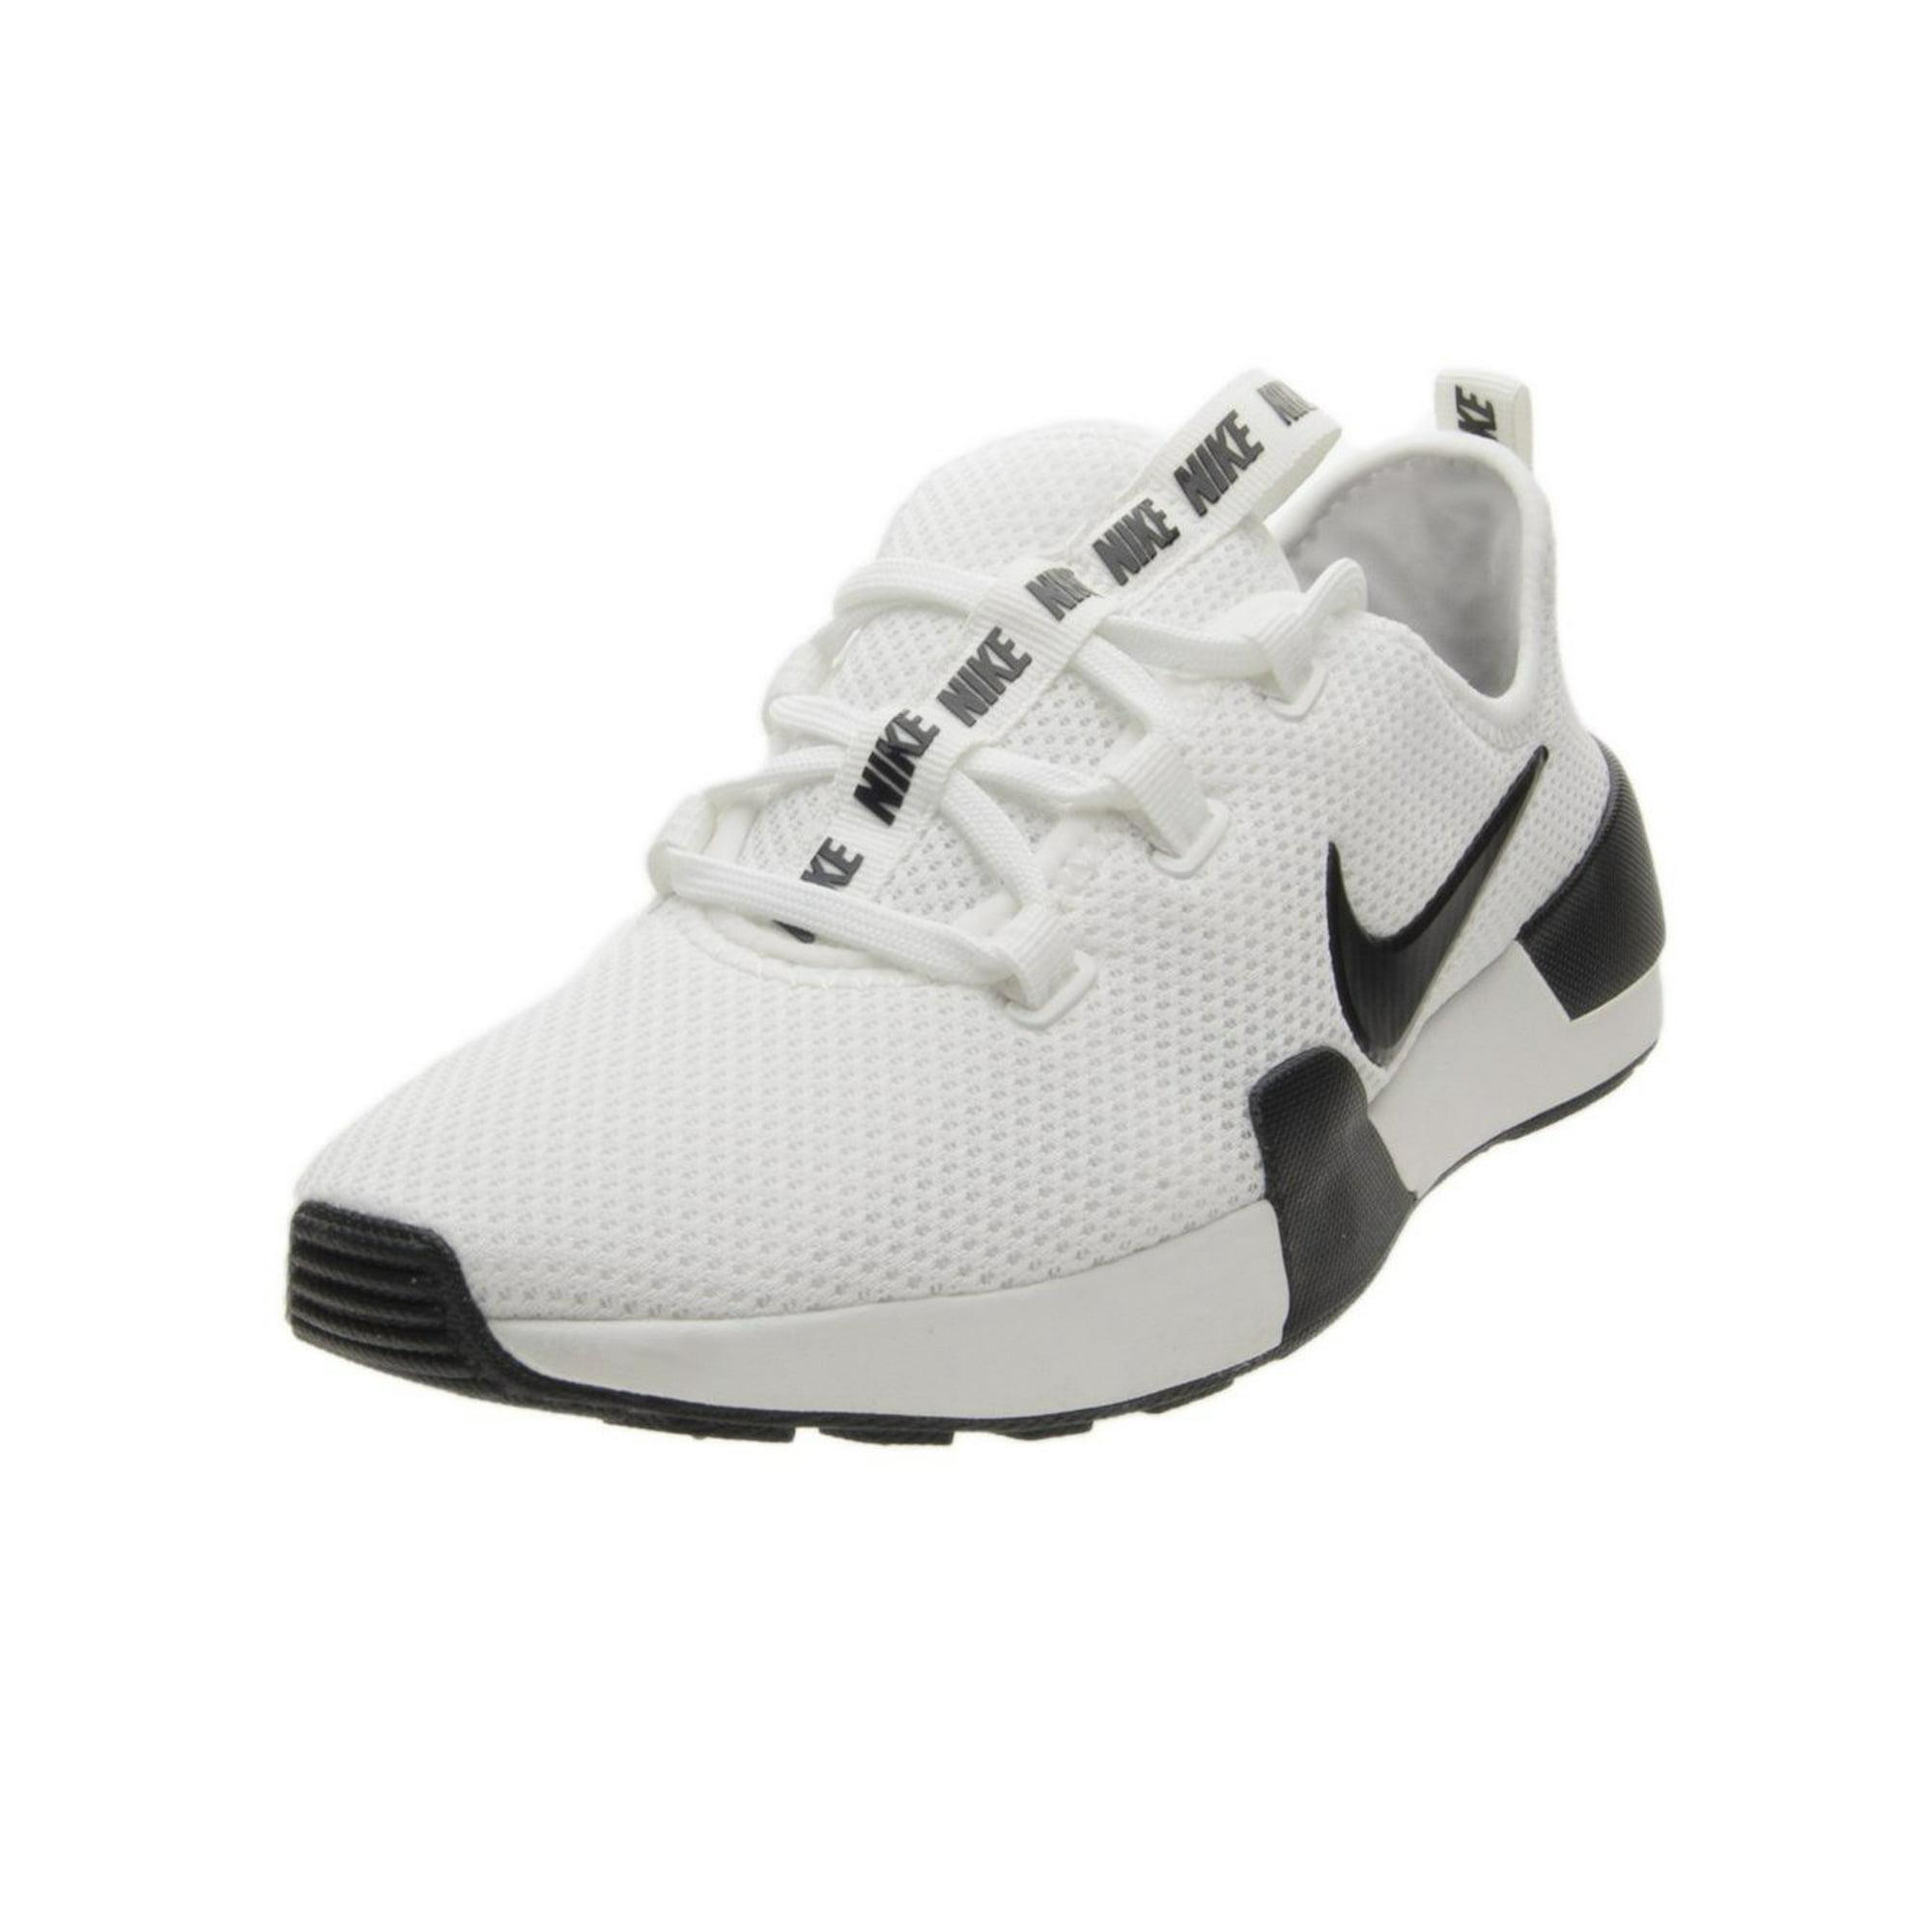 Nike Women's Ashin Modern Summit White Black Low Top Mesh